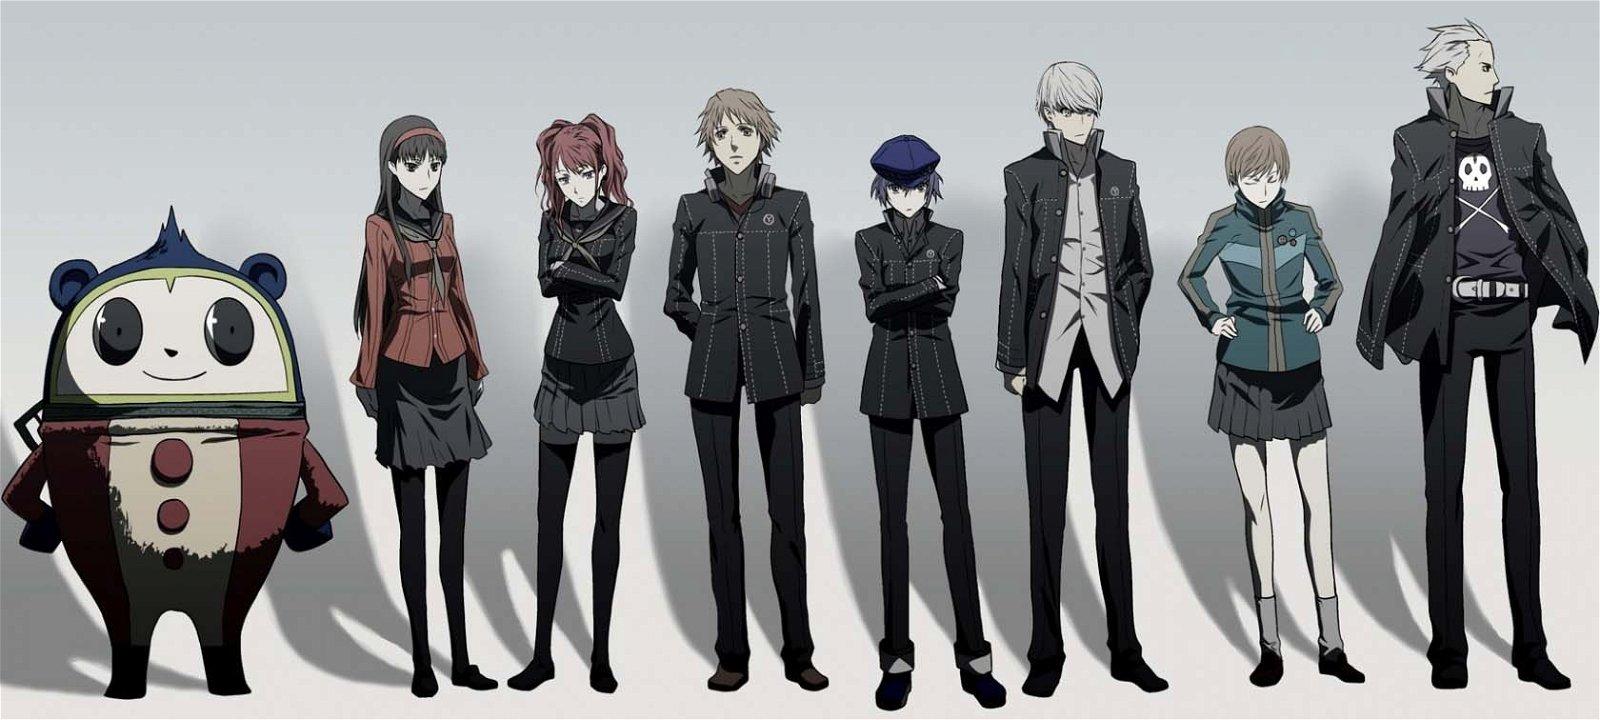 Persona_4_Parody-Wallpaper-1680X1050.Jpg